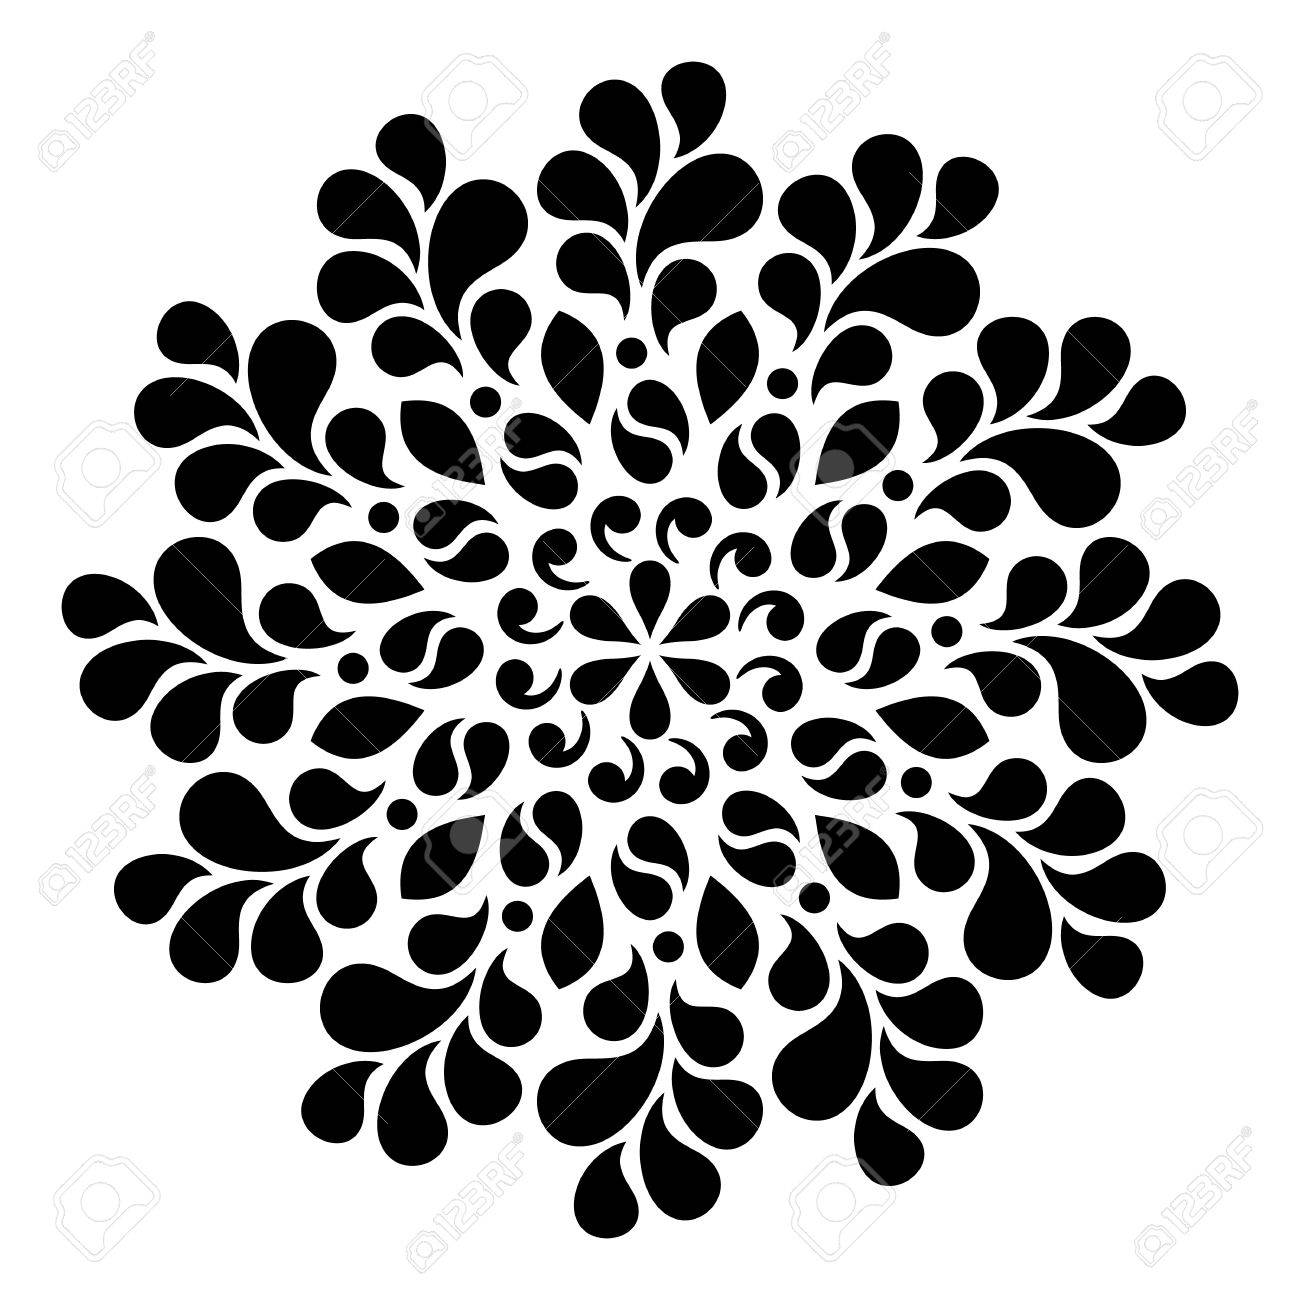 Black geometric abstract round mandala illustration - 56783542